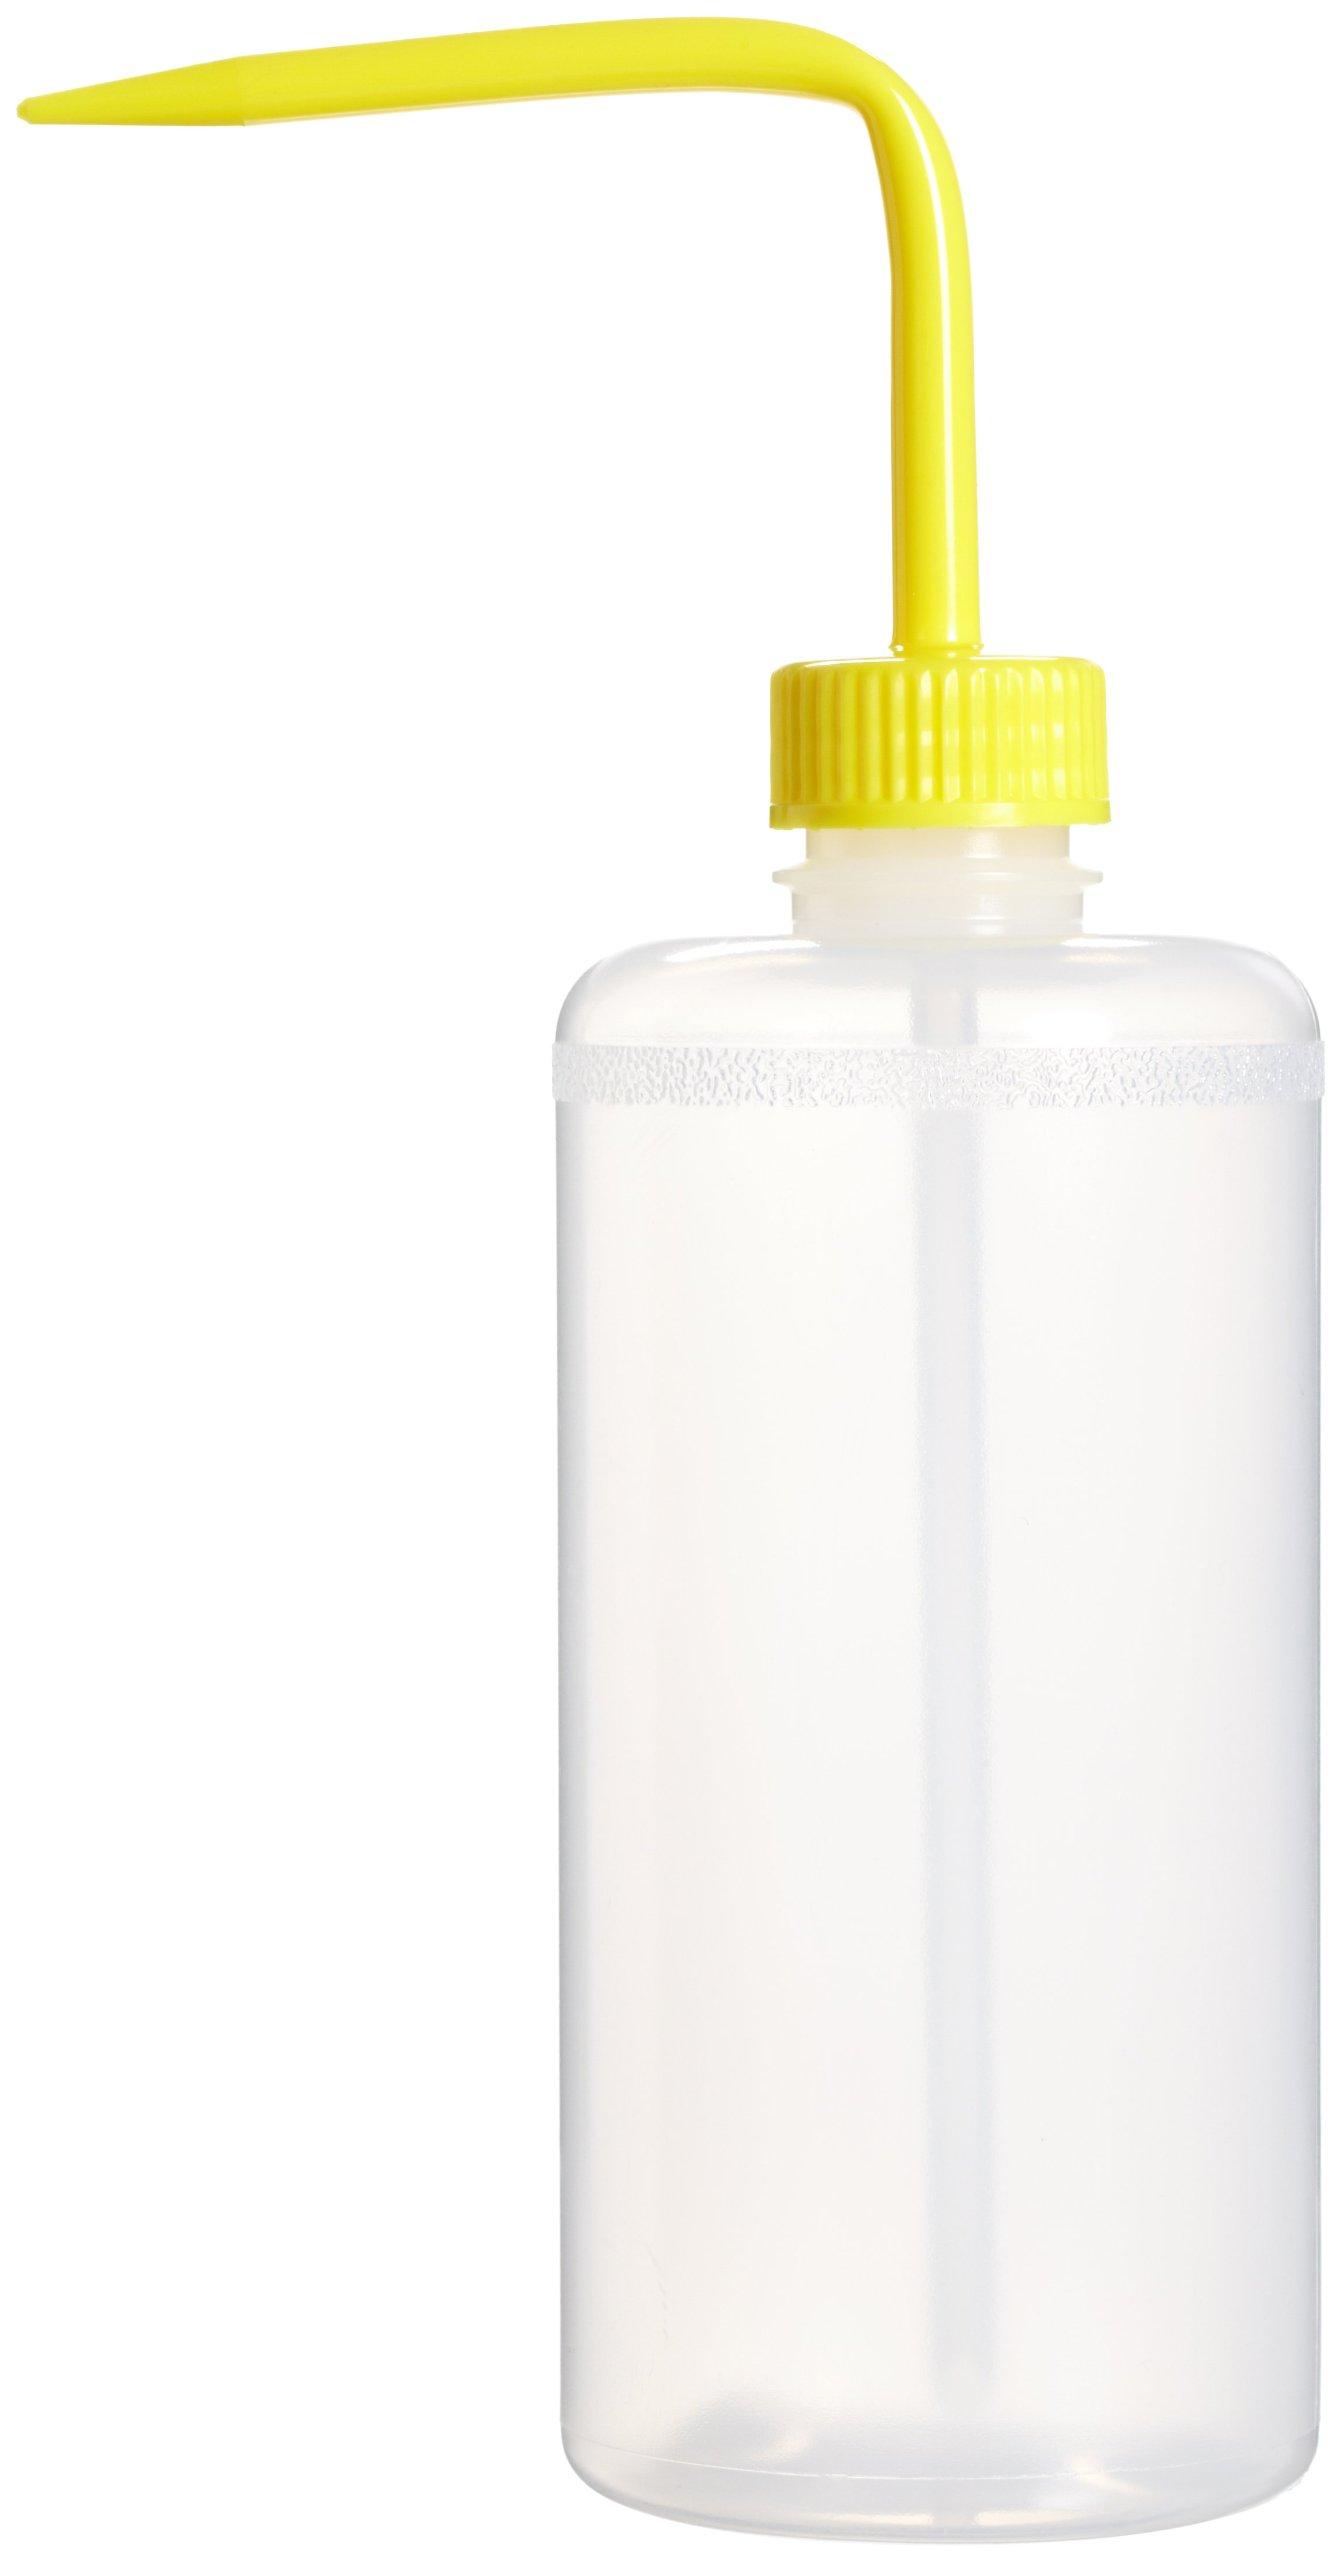 Bel-Art Narrow-Mouth 500ml (16oz) Polyethylene Wash Bottles; Yellow Polypropylene Cap, 28mm Closure (Pack of 6) (F11614-0500)